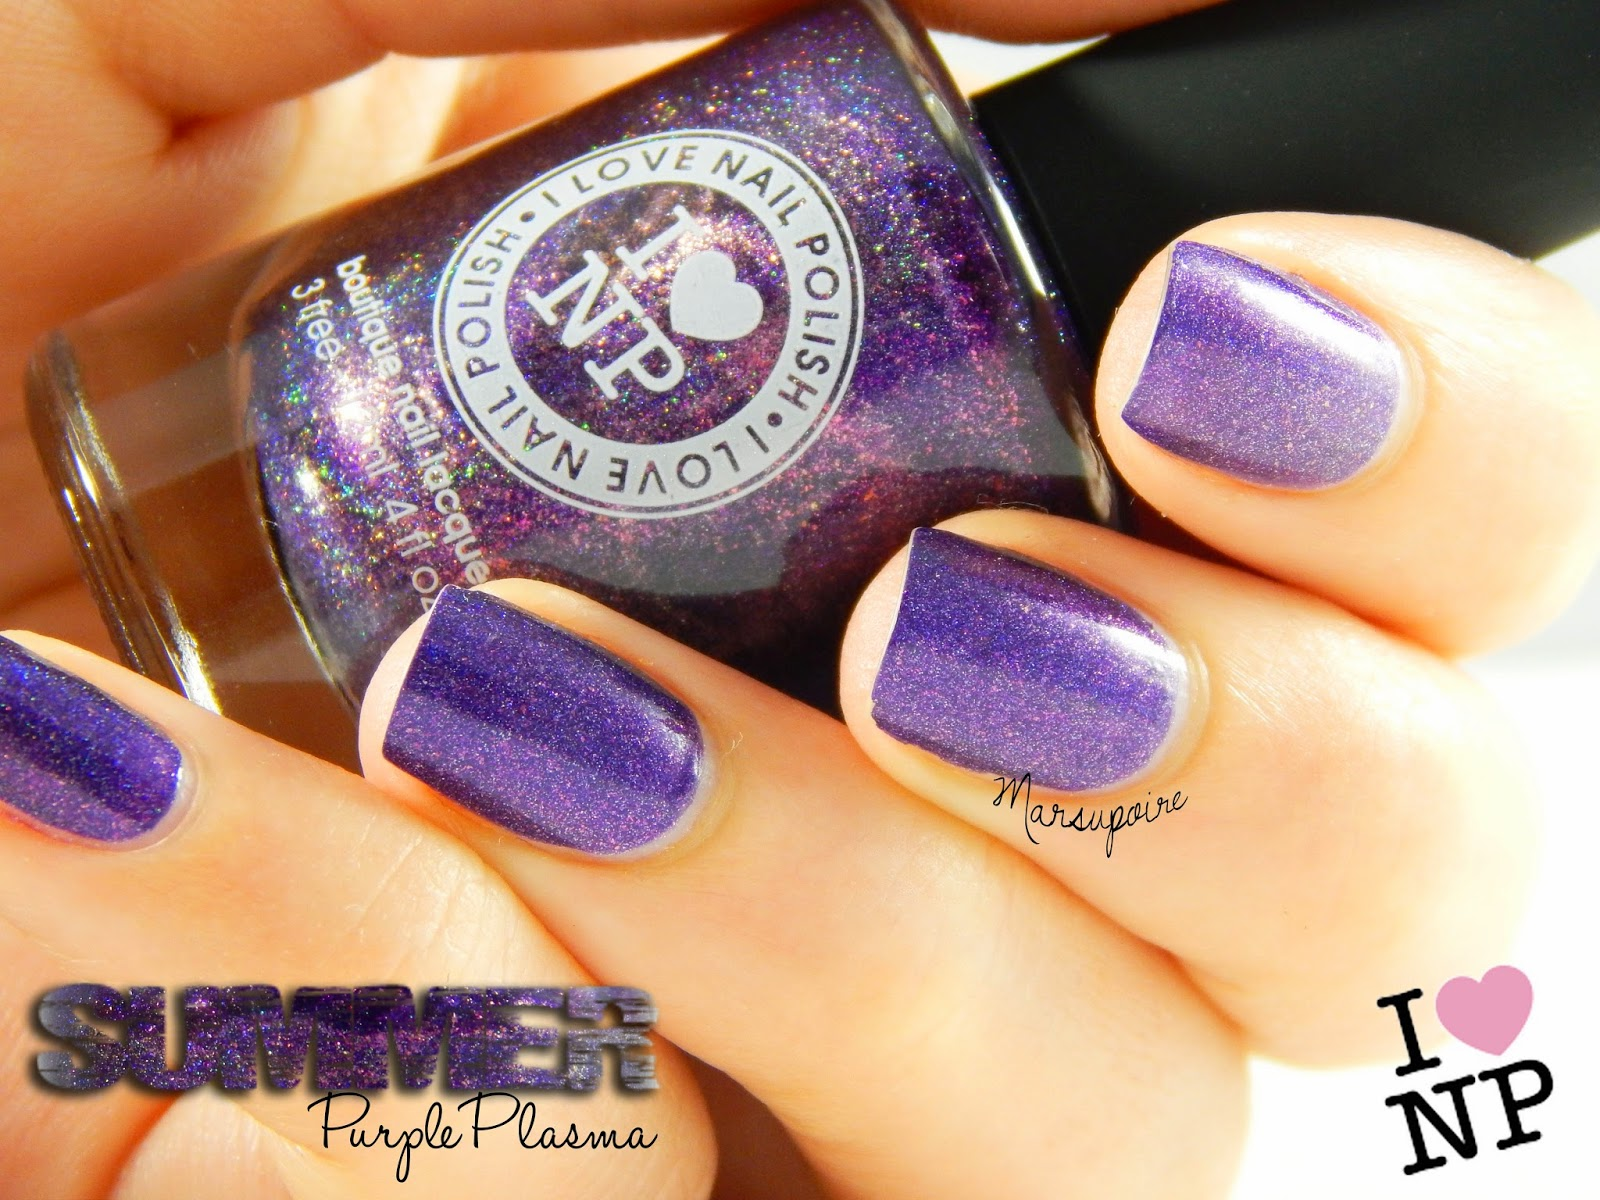 Vernis_ILNP_purple plasma_2